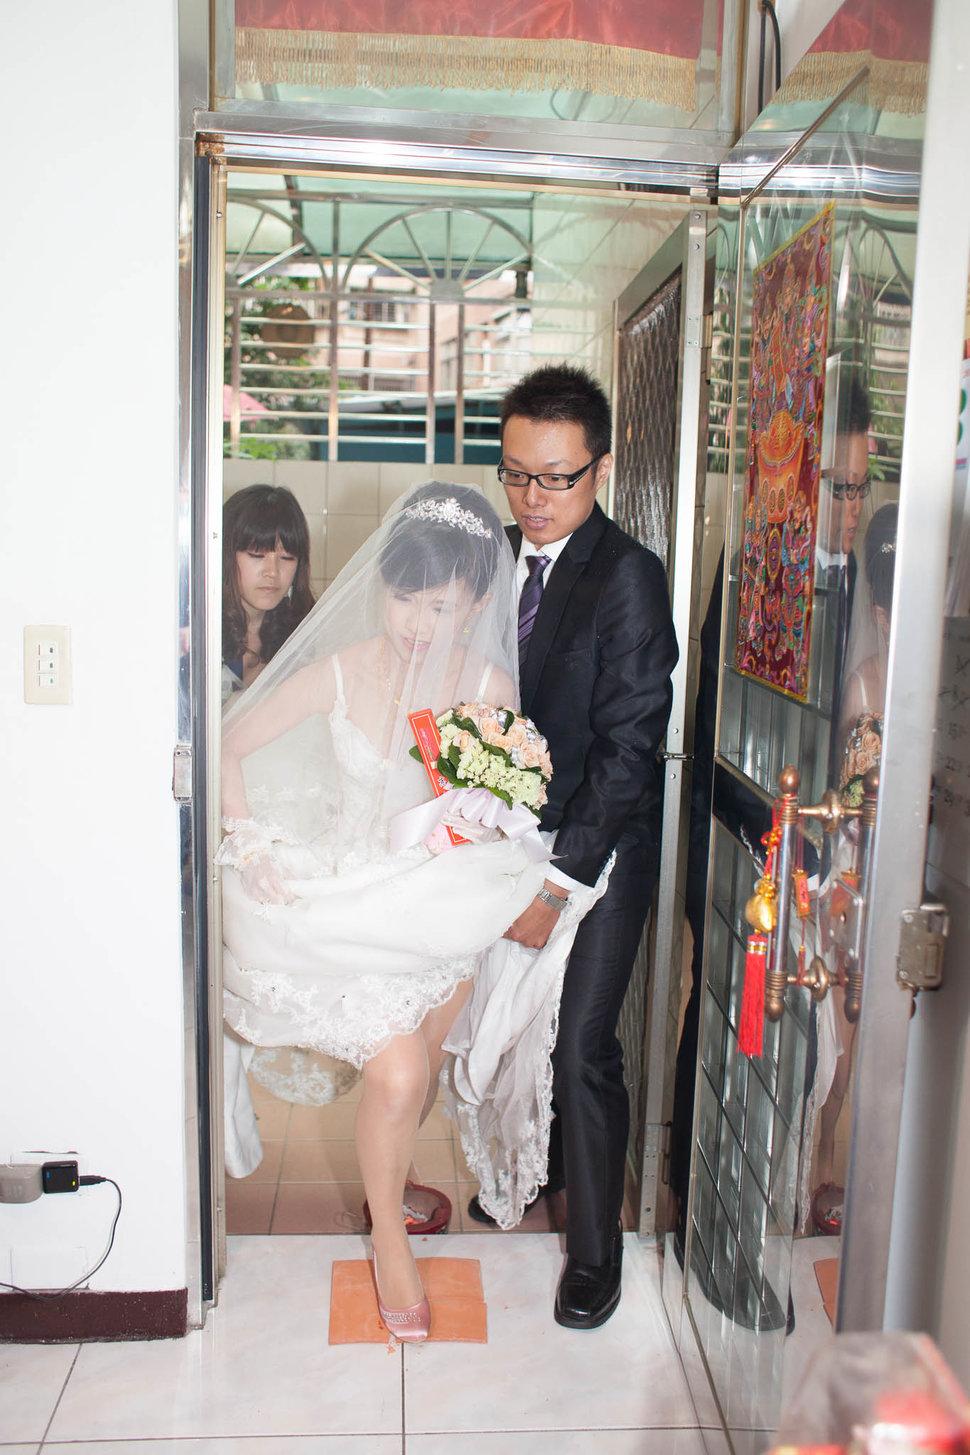 18PHOTO-青蛙王子娶新娘❤️(編號:218626) - 18PHOTO 婚紗影像攝影工作室 - 結婚吧